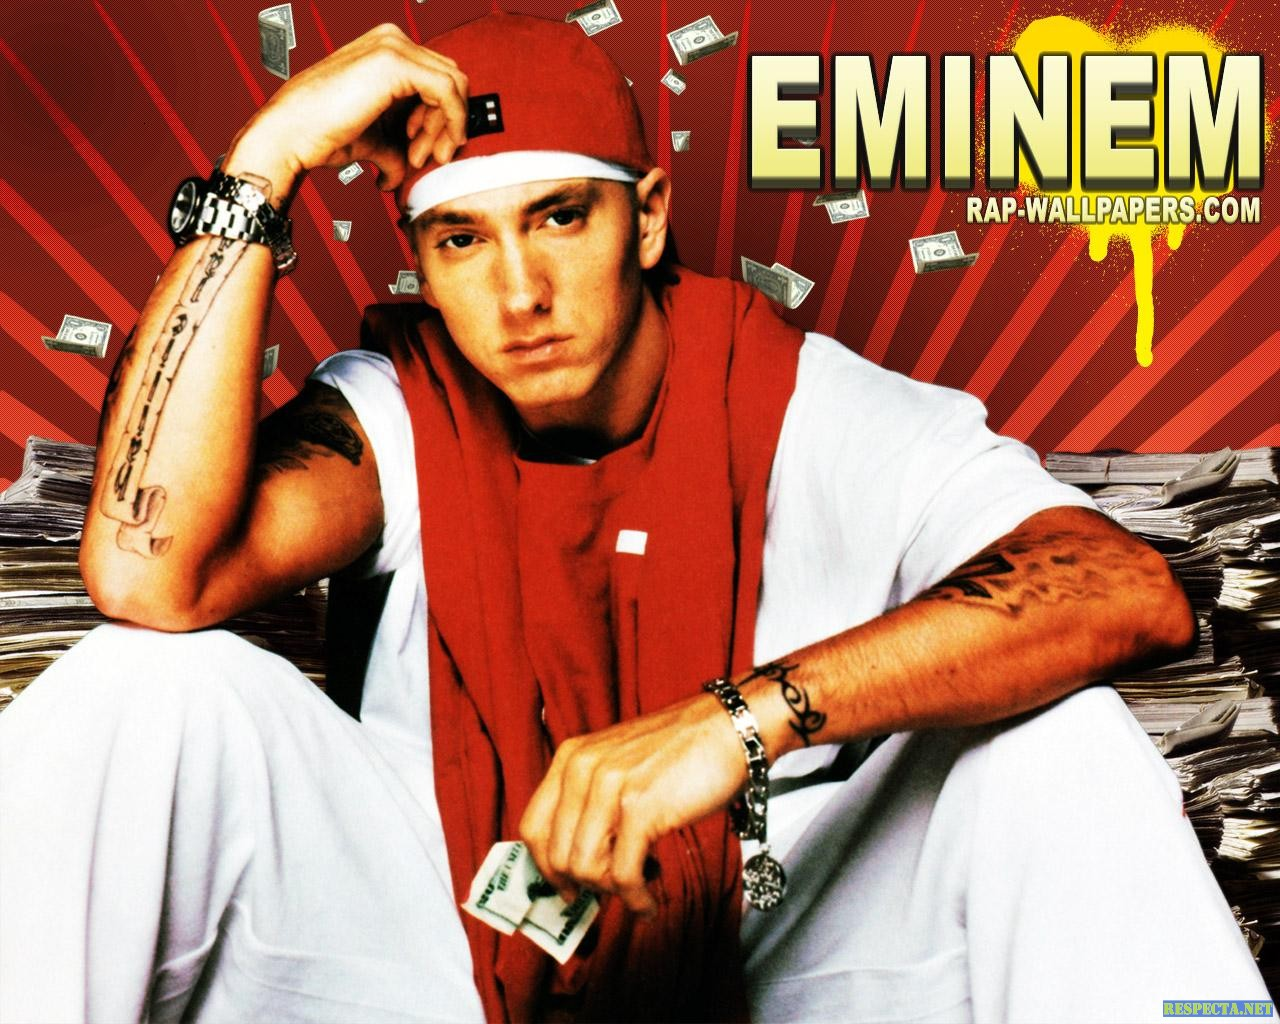 http://4.bp.blogspot.com/_7ub7OOBg4Xc/TVG67g6ozYI/AAAAAAAAAqI/PC9T3zyL4o8/s1600/Eminem_wallpaper1.jpg